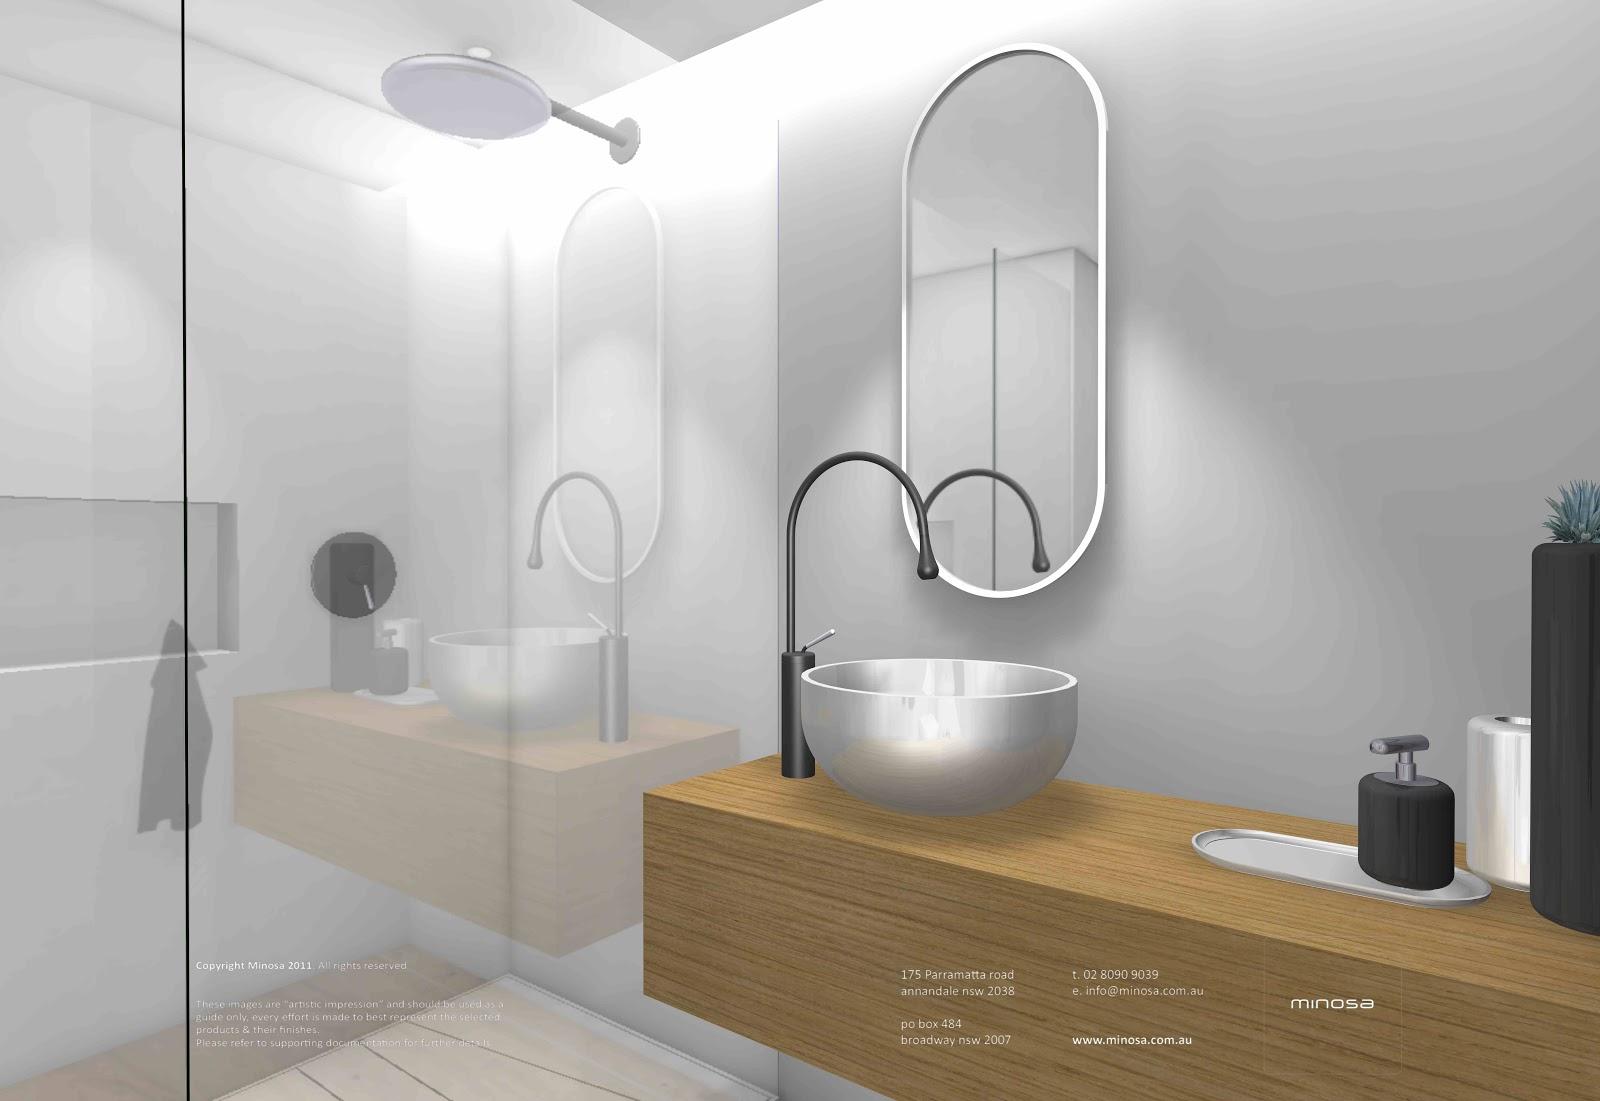 Minosa new minosa bathroom design resort style ensuite - Main Bathroom Powder Room Posted By Minosa